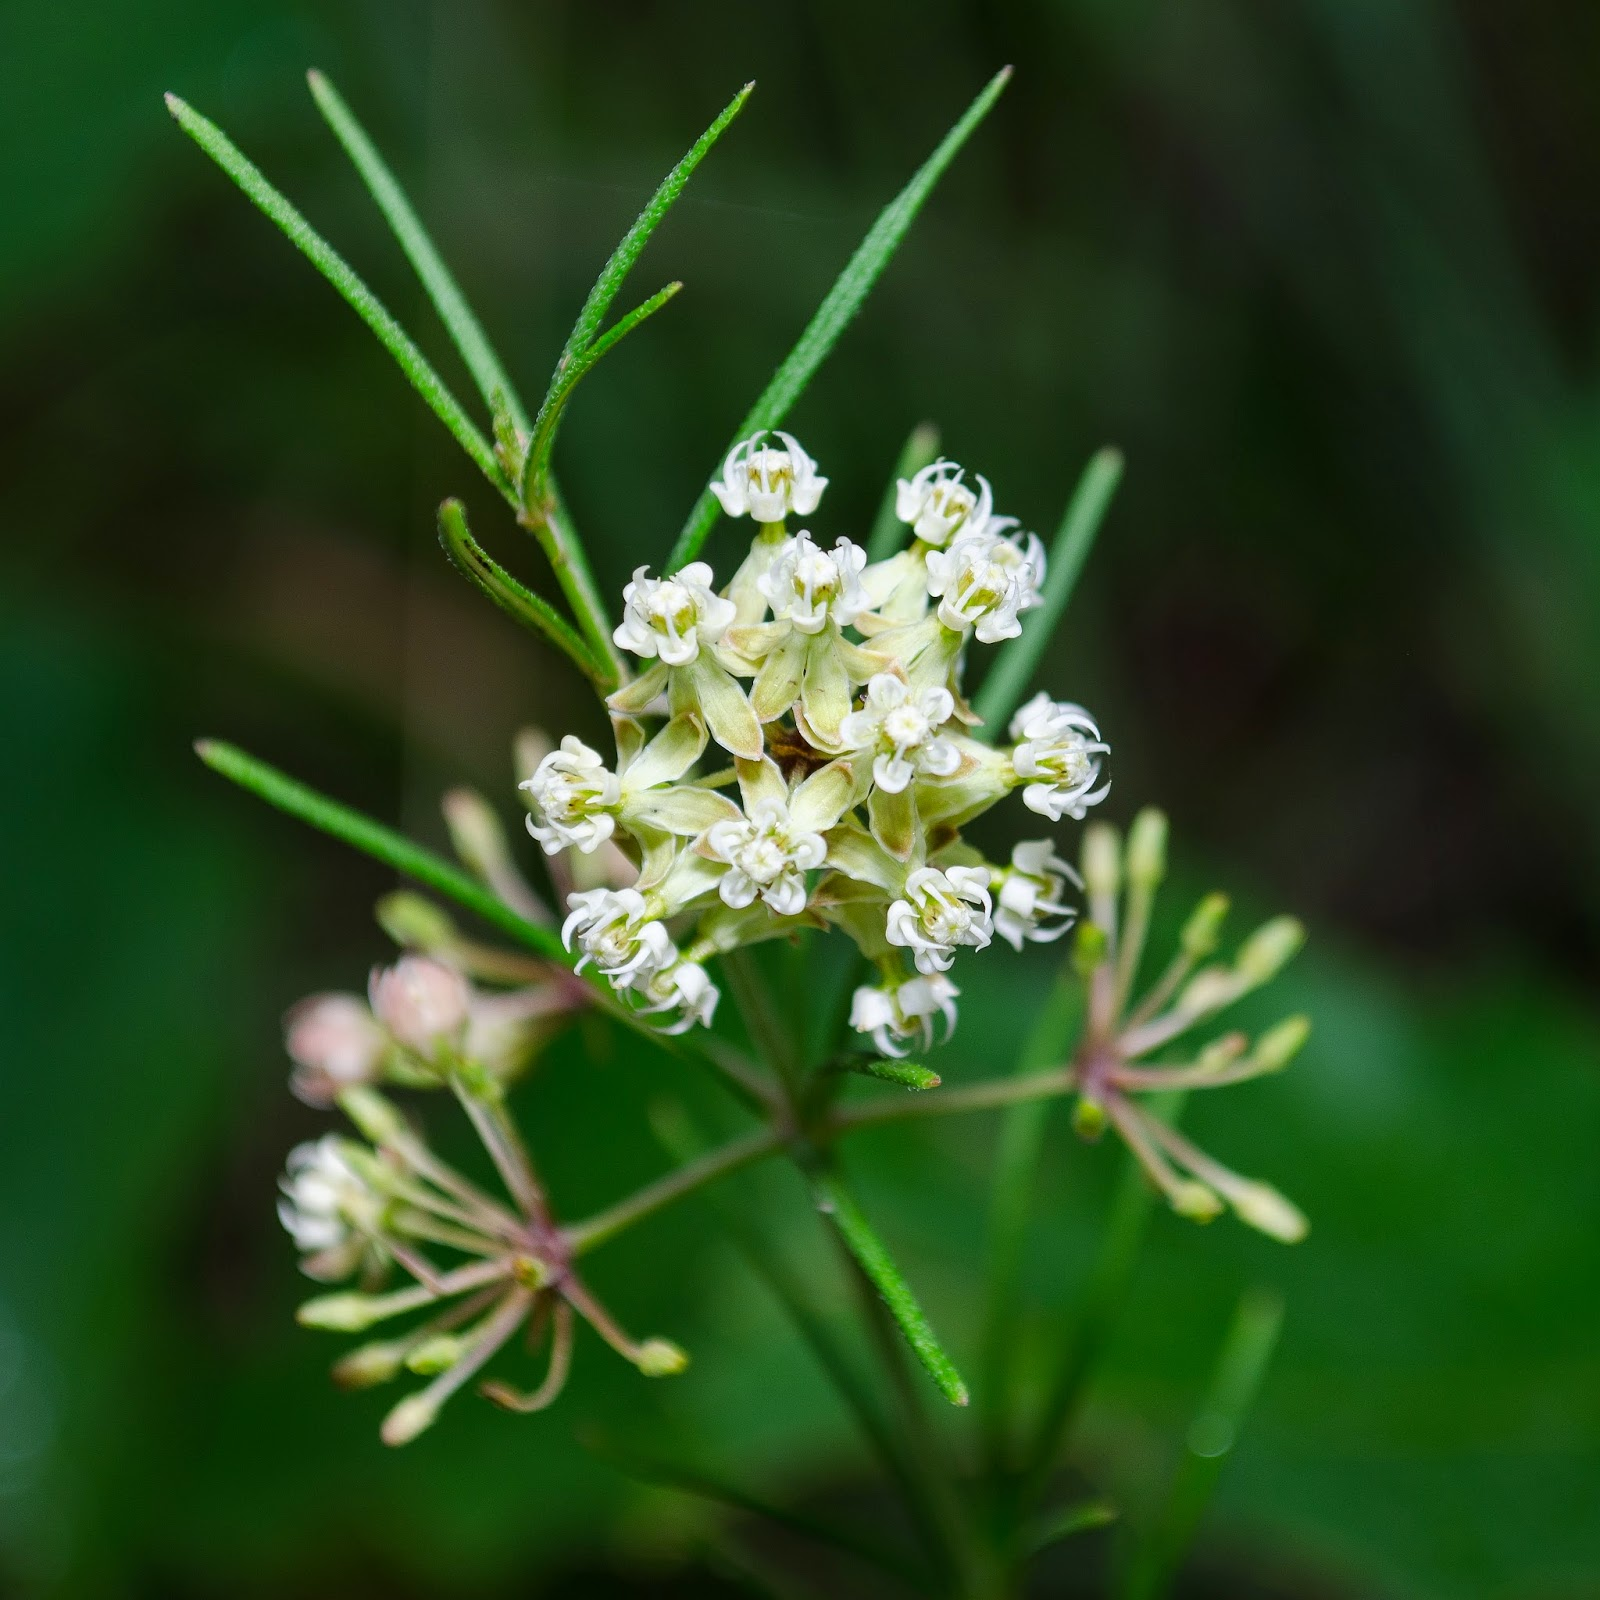 Whorled Milkweed, Asclepias verticillata